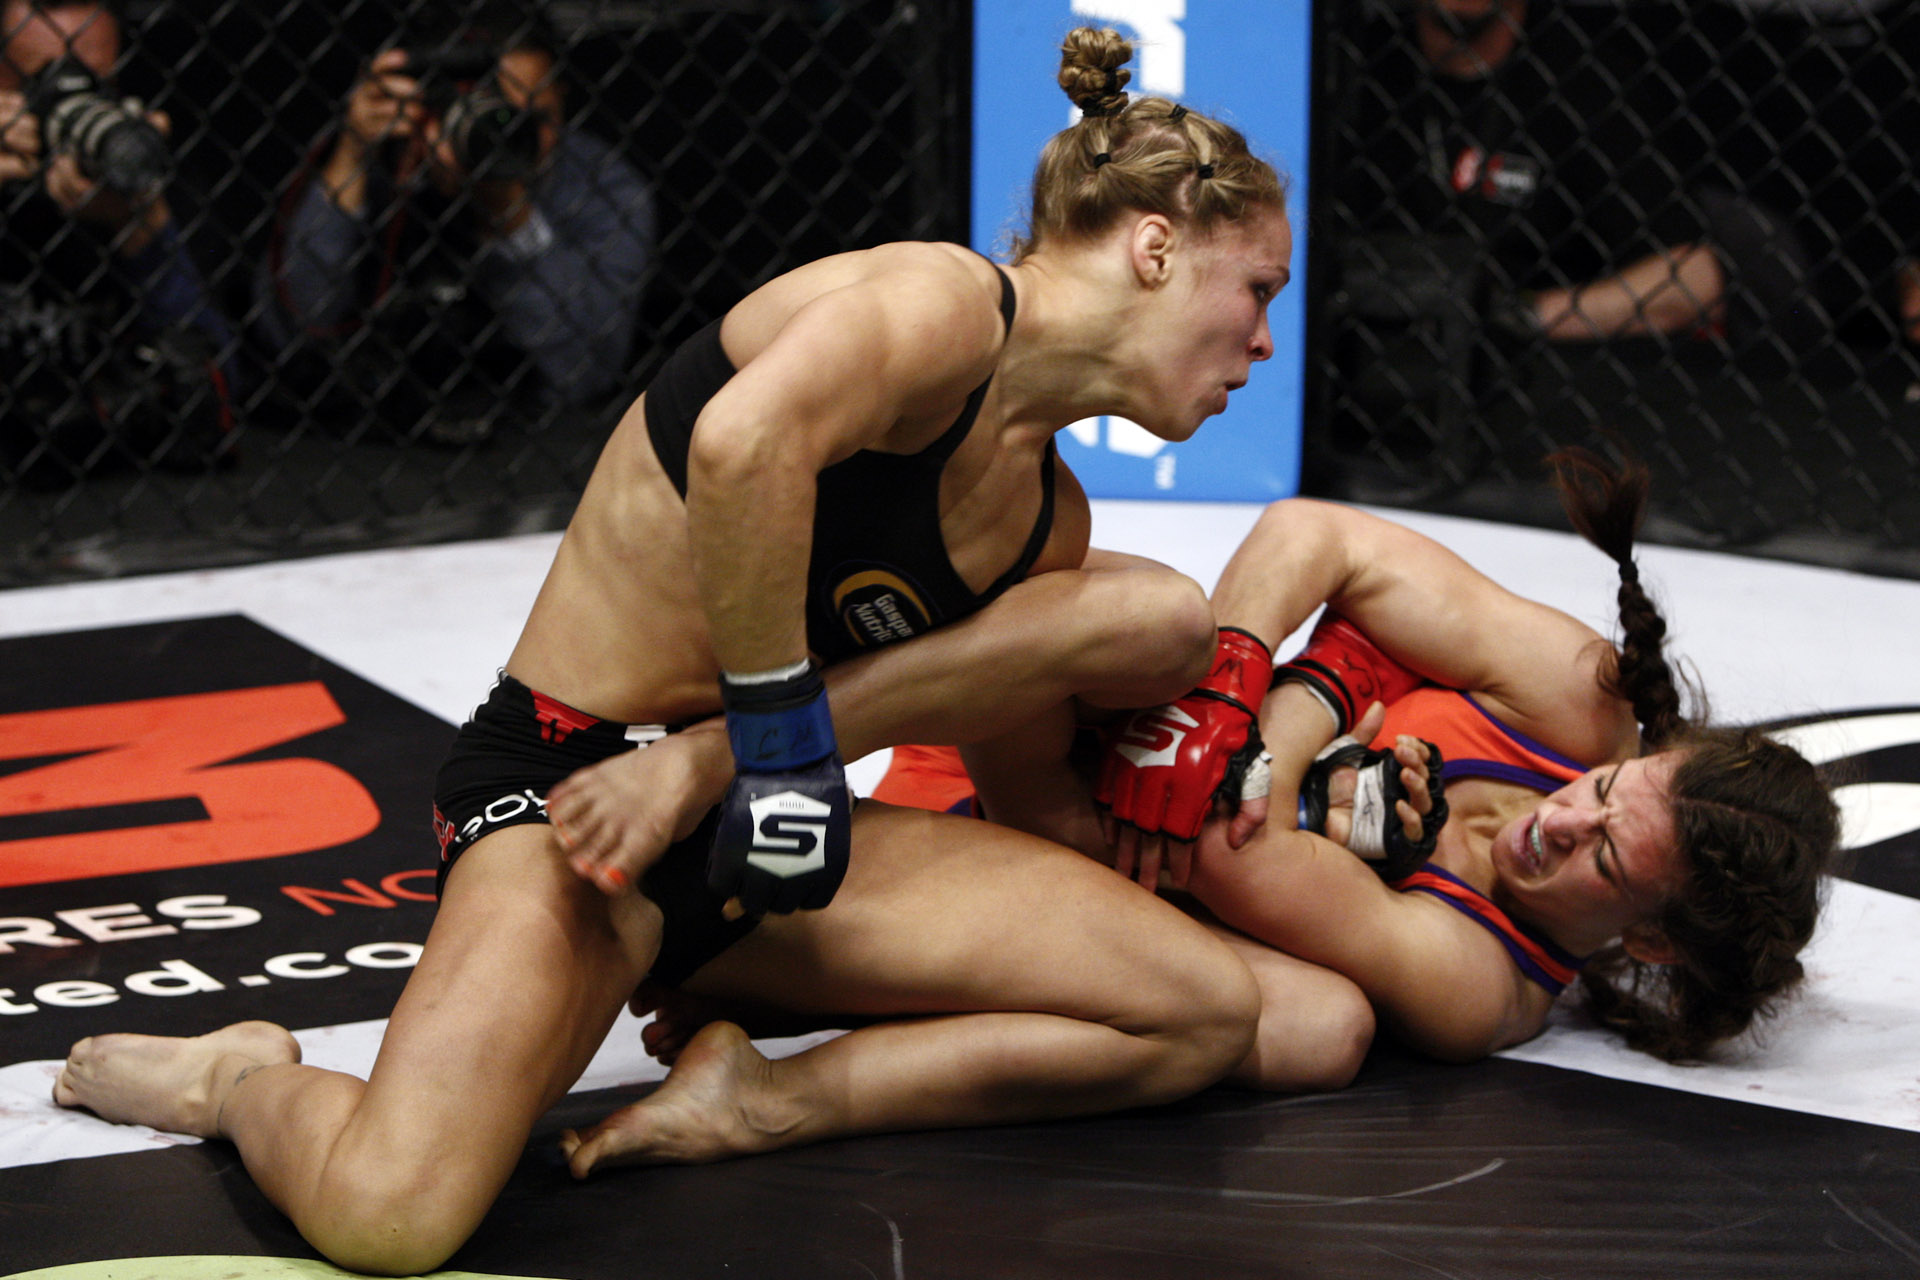 Strikeforce: Tate v Rousey